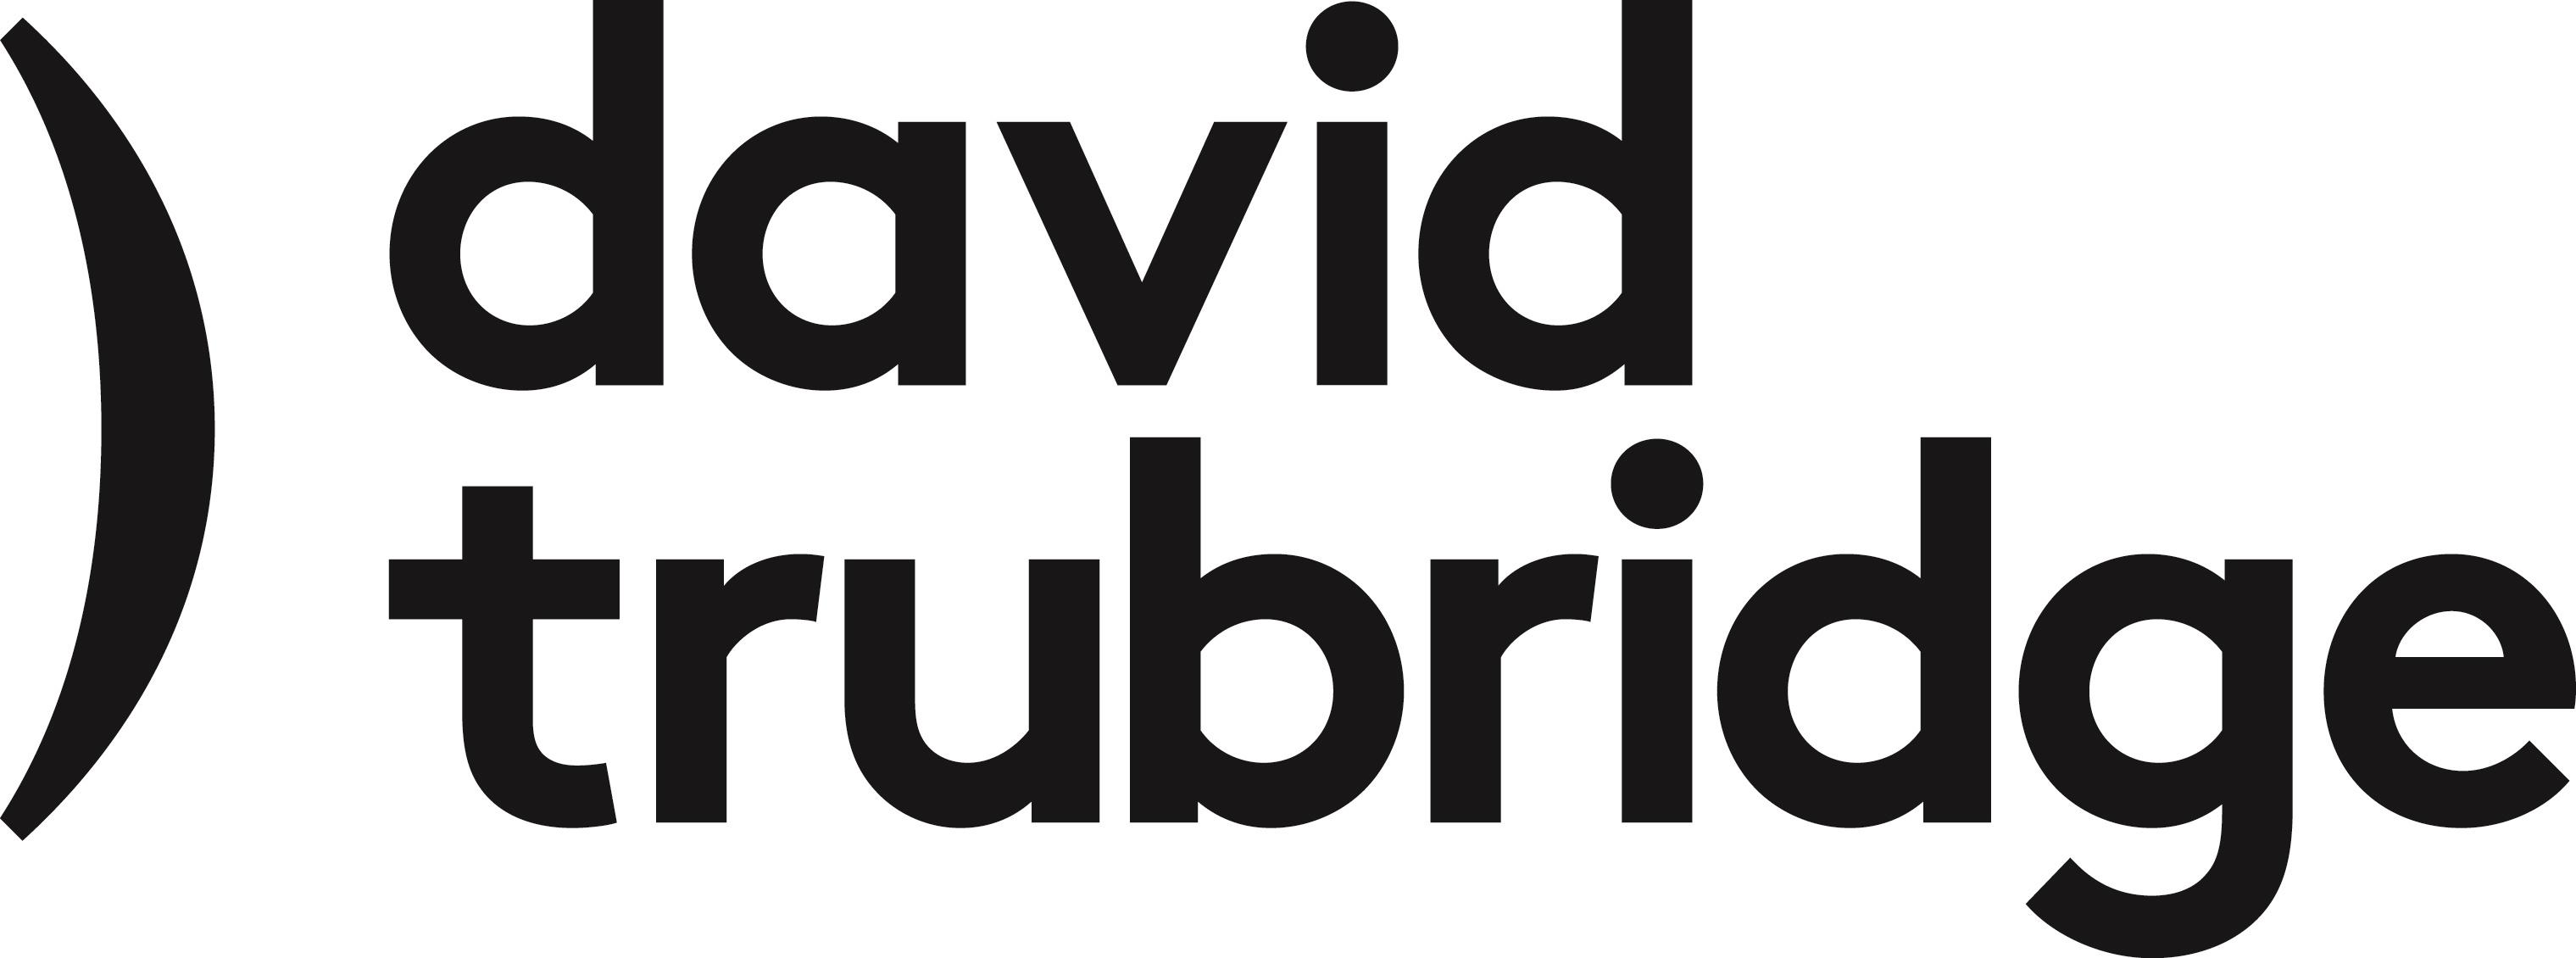 david-trubridge